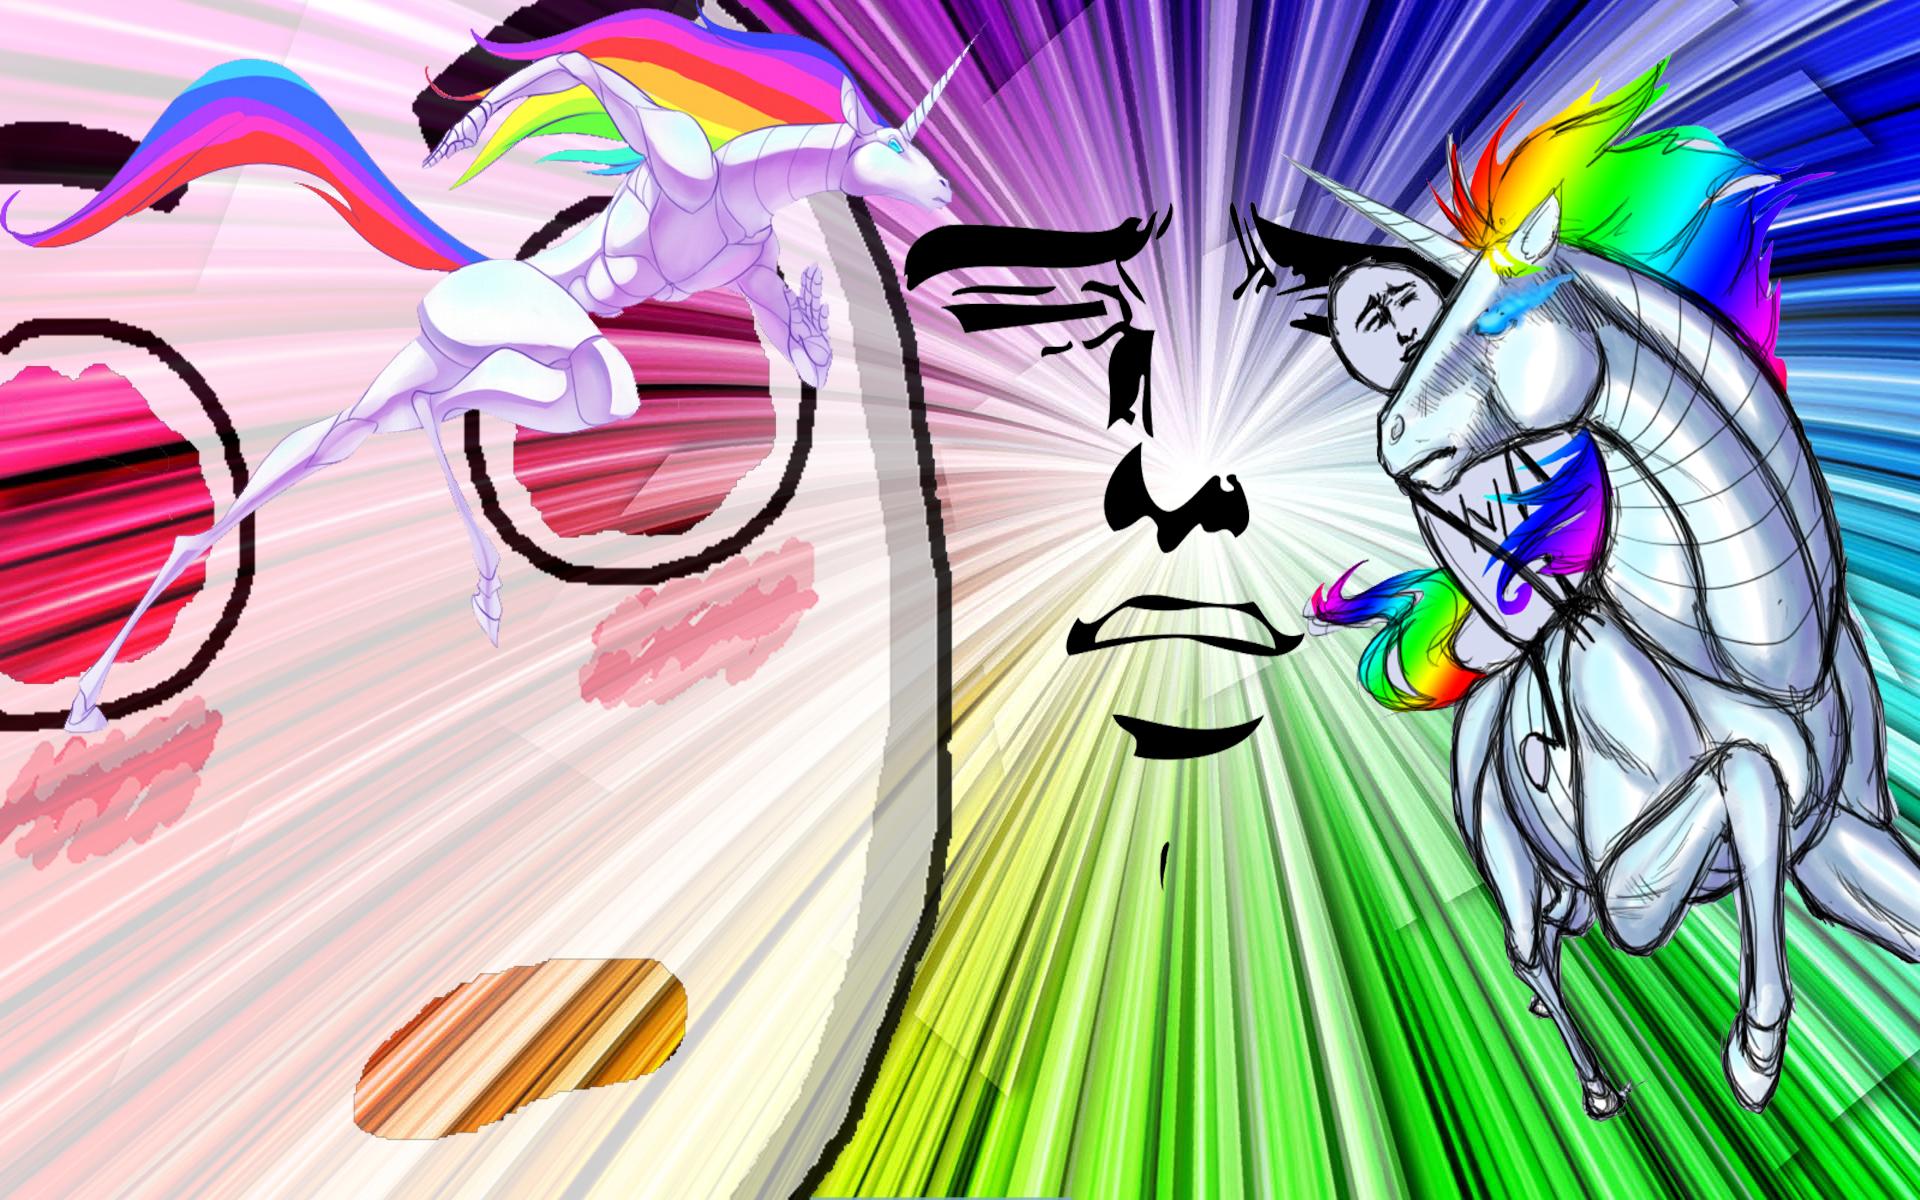 Robot Unicorn Wallpaper 1920x1200 Robot Unicorn Attack Rainbows 1920x1200